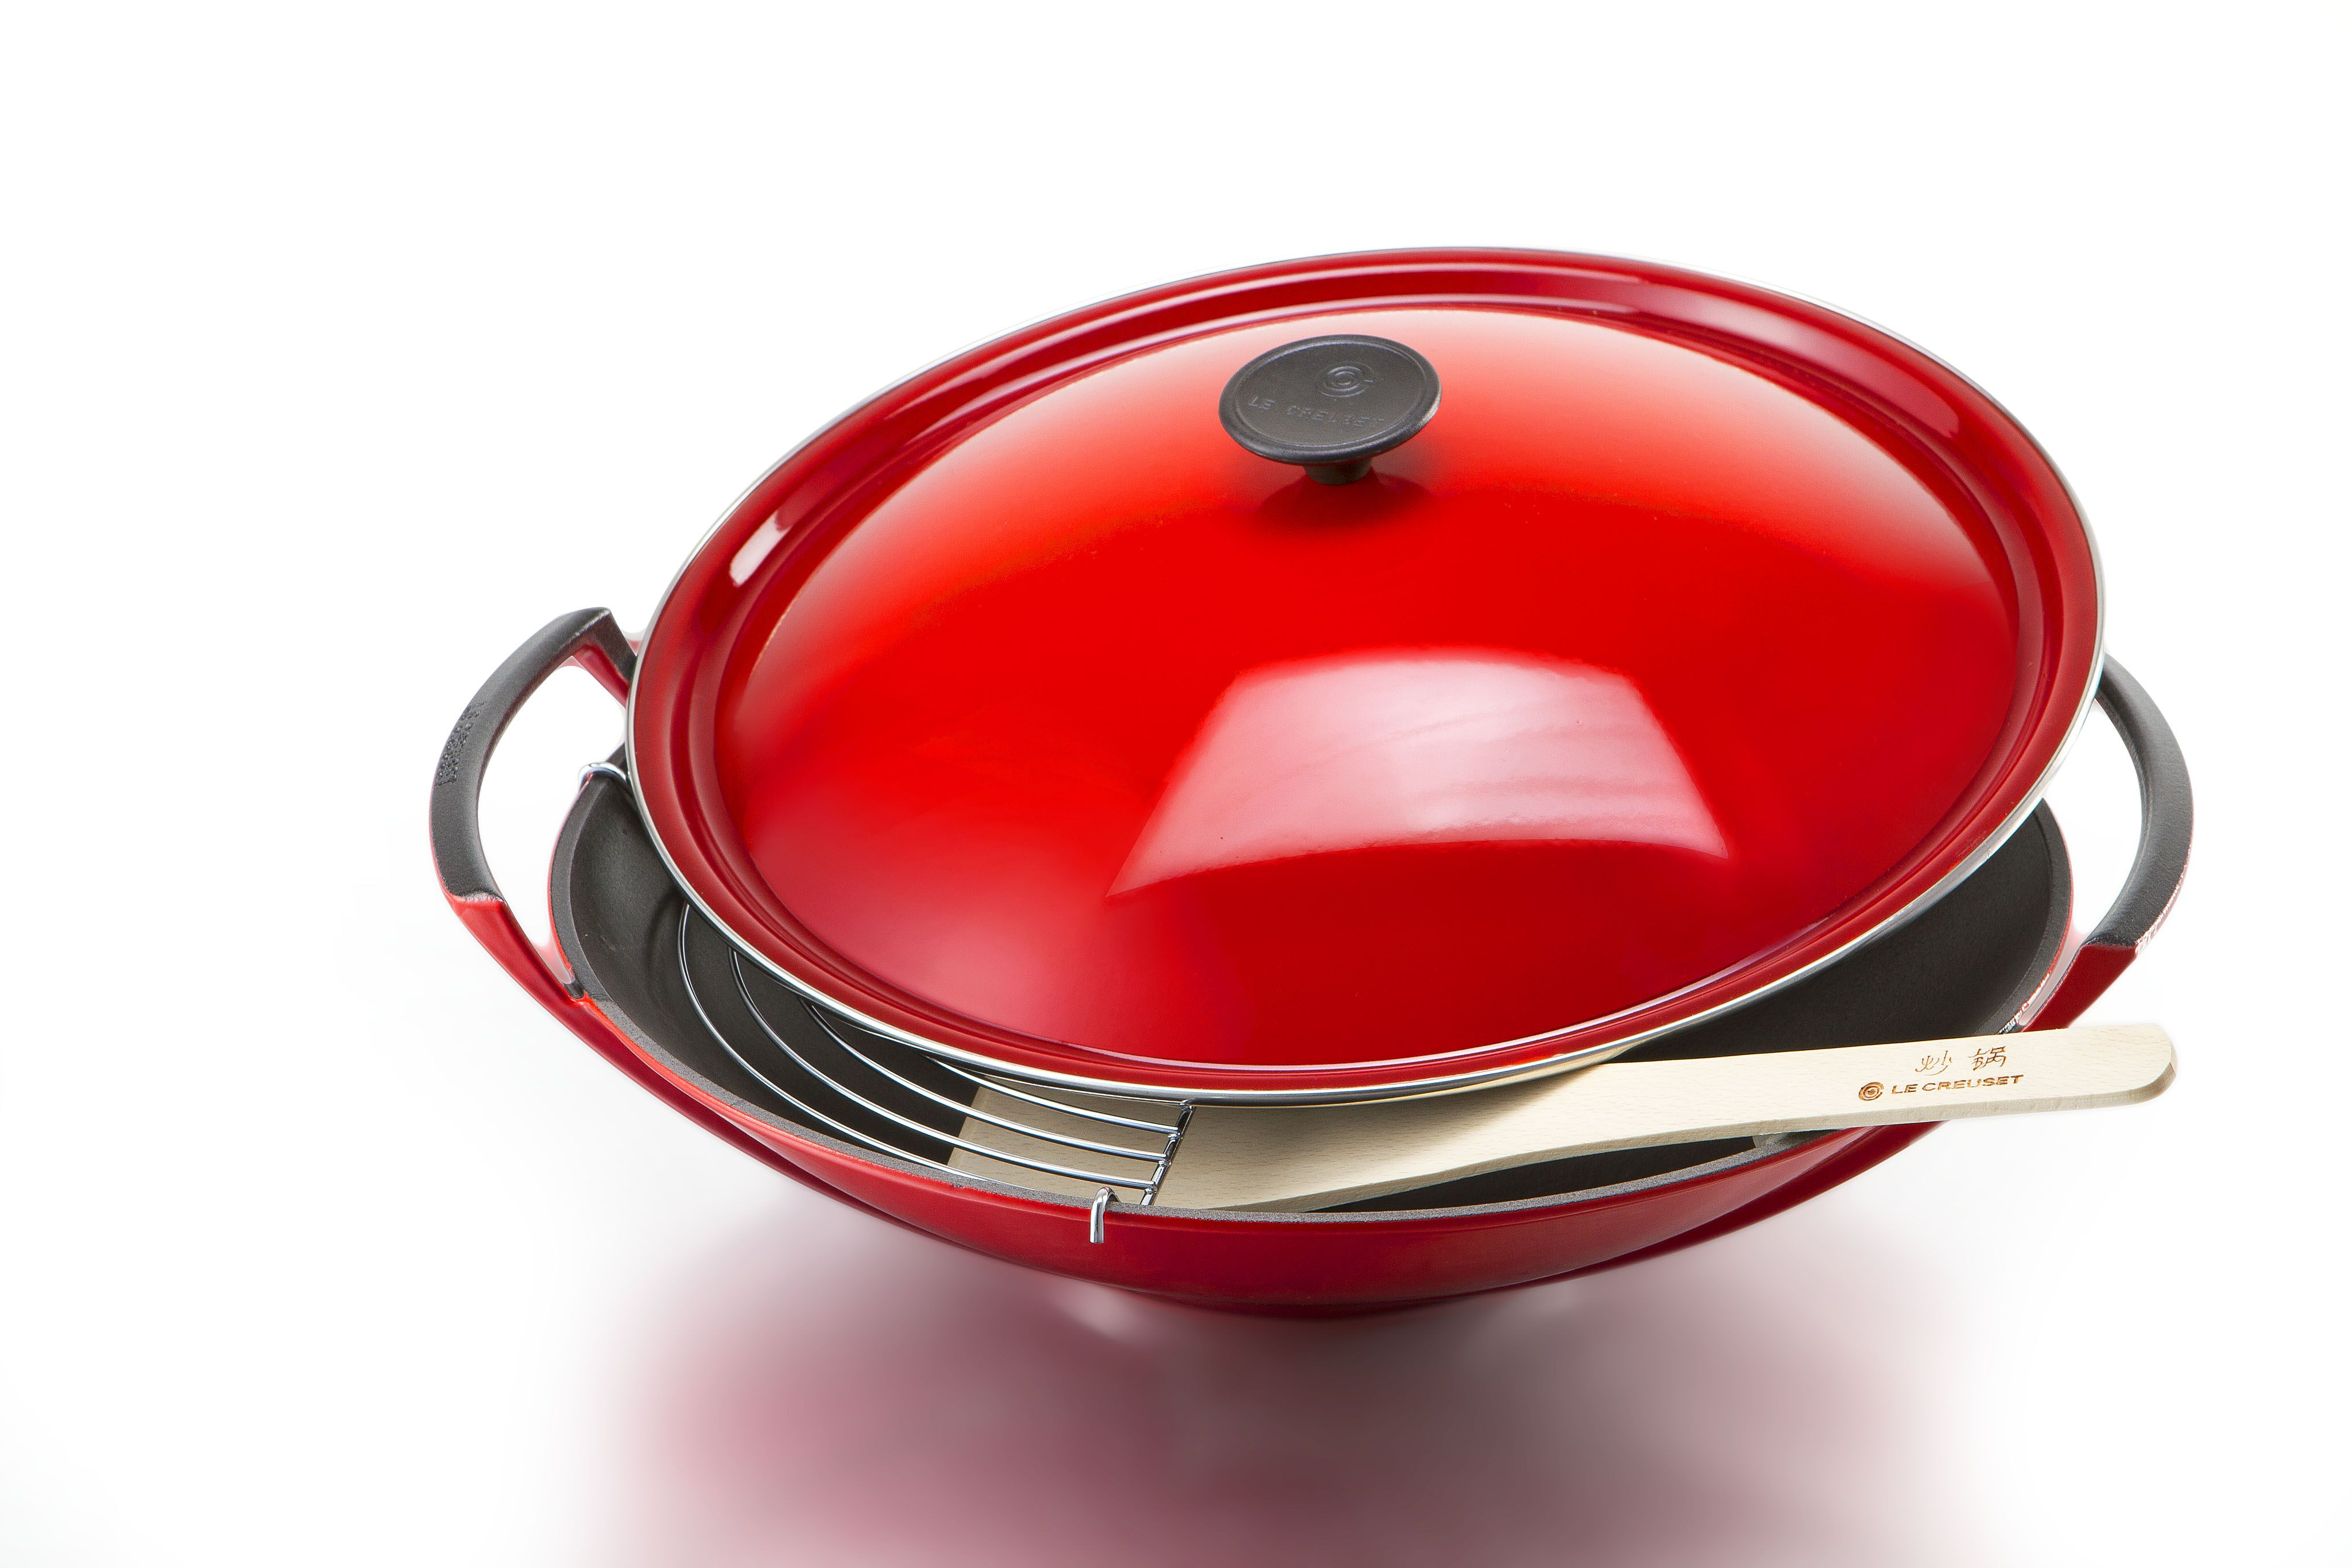 le creuset wok cherry pinterest woks kitchen gadgets and kitchens. Black Bedroom Furniture Sets. Home Design Ideas